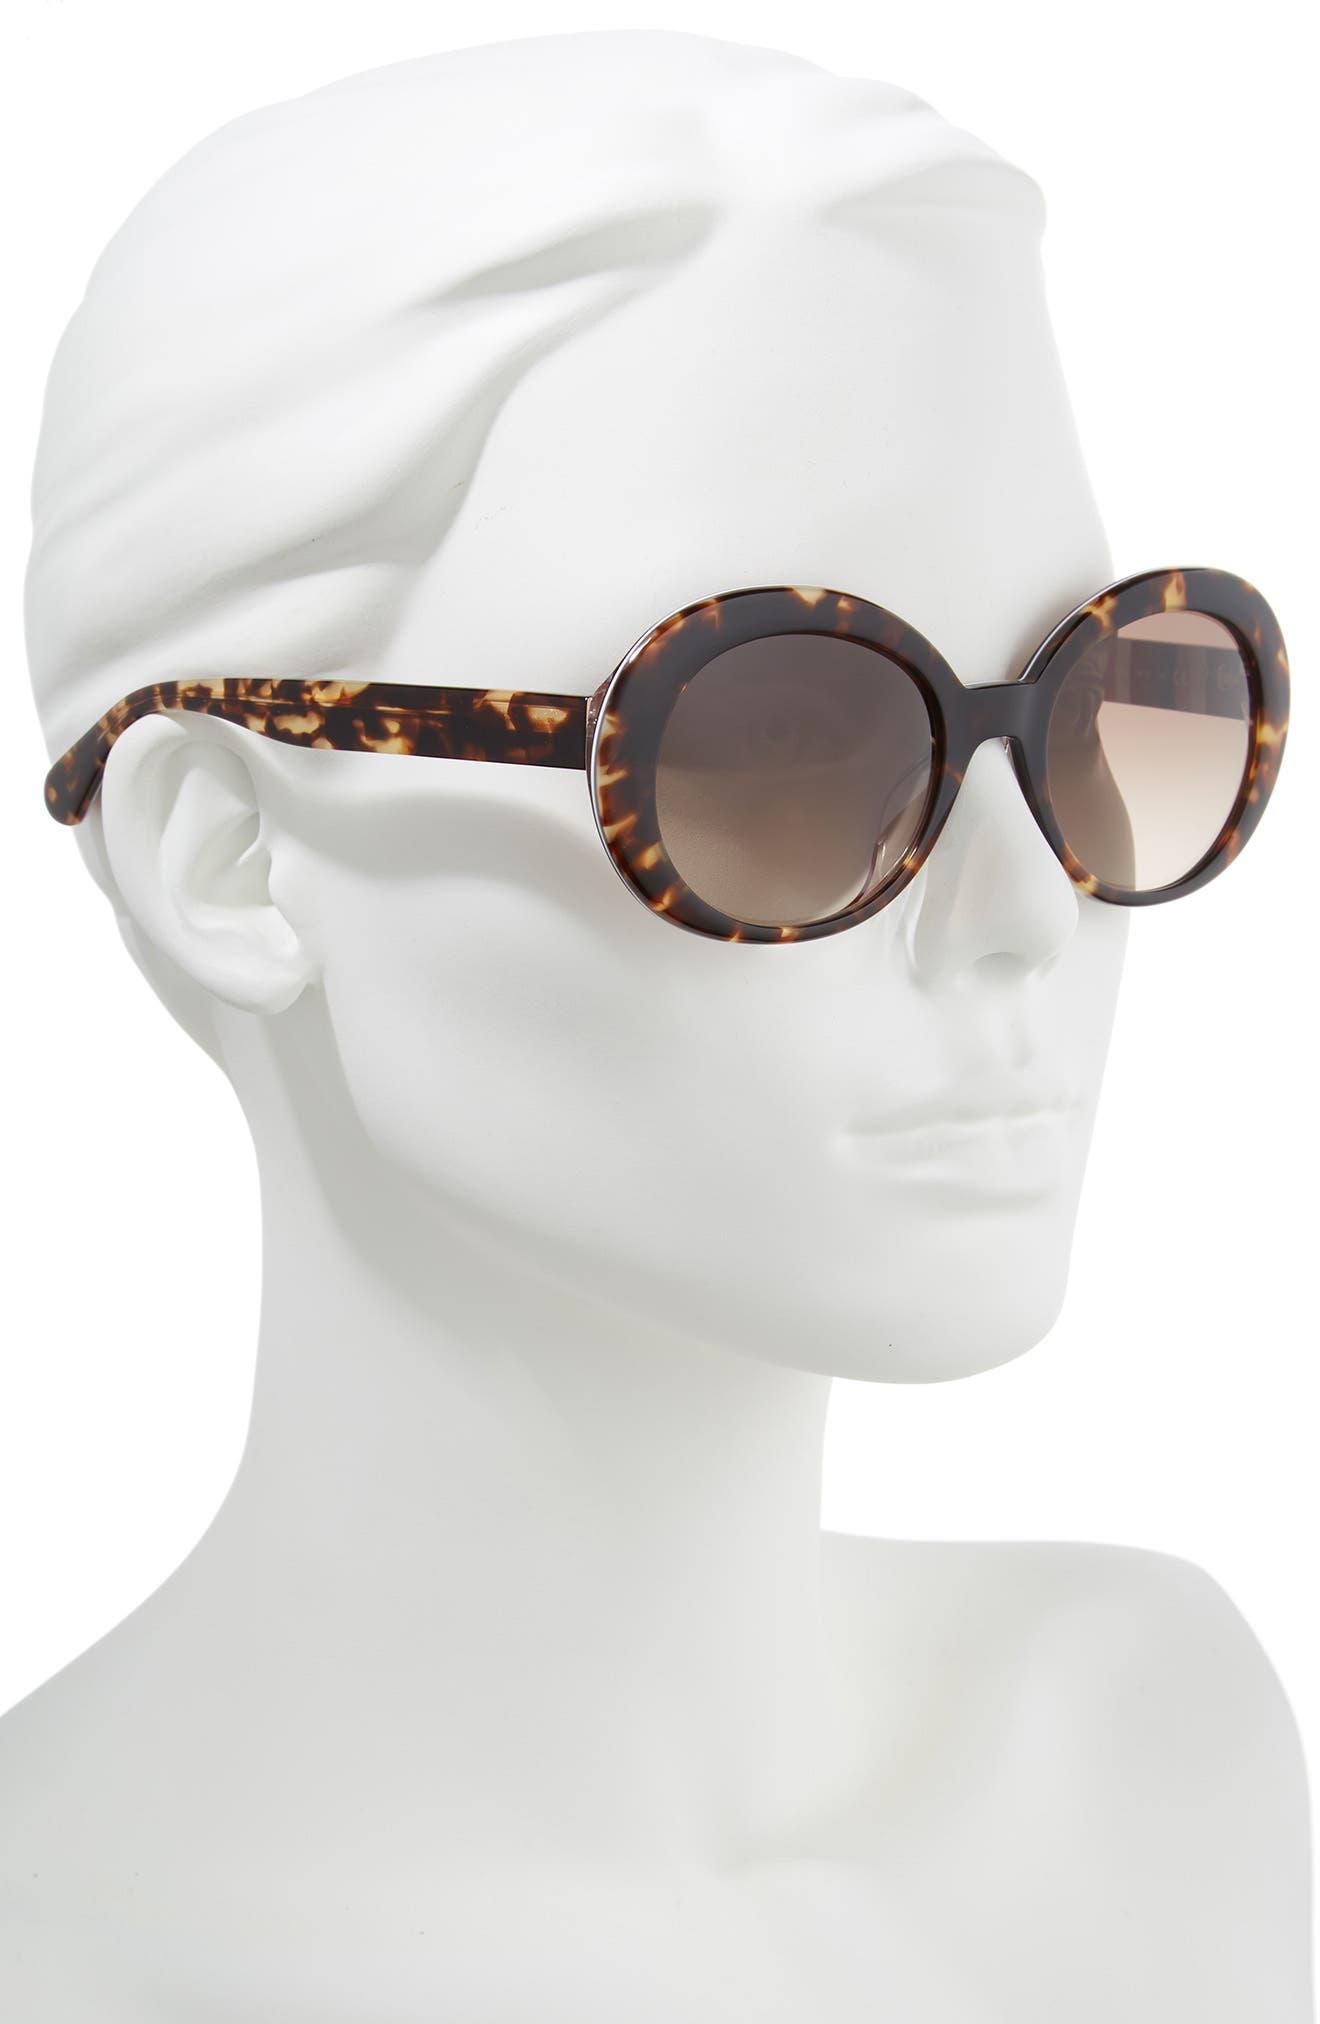 cindra 54mm gradient round sunglasses,                             Alternate thumbnail 2, color,                             DARK HAVANA